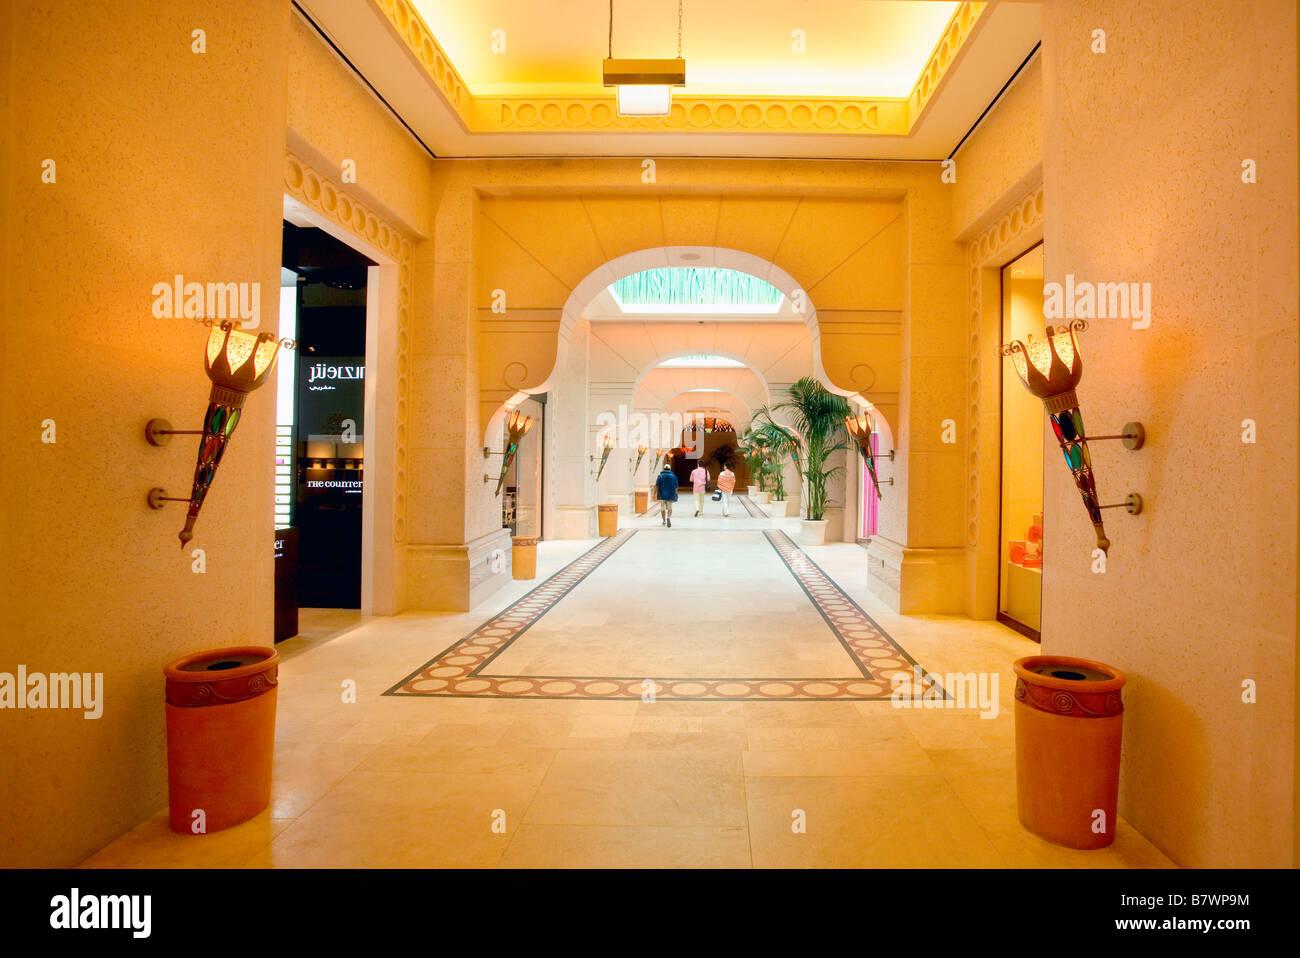 Interiors Dubai Jumeirah Www Indiepedia Org